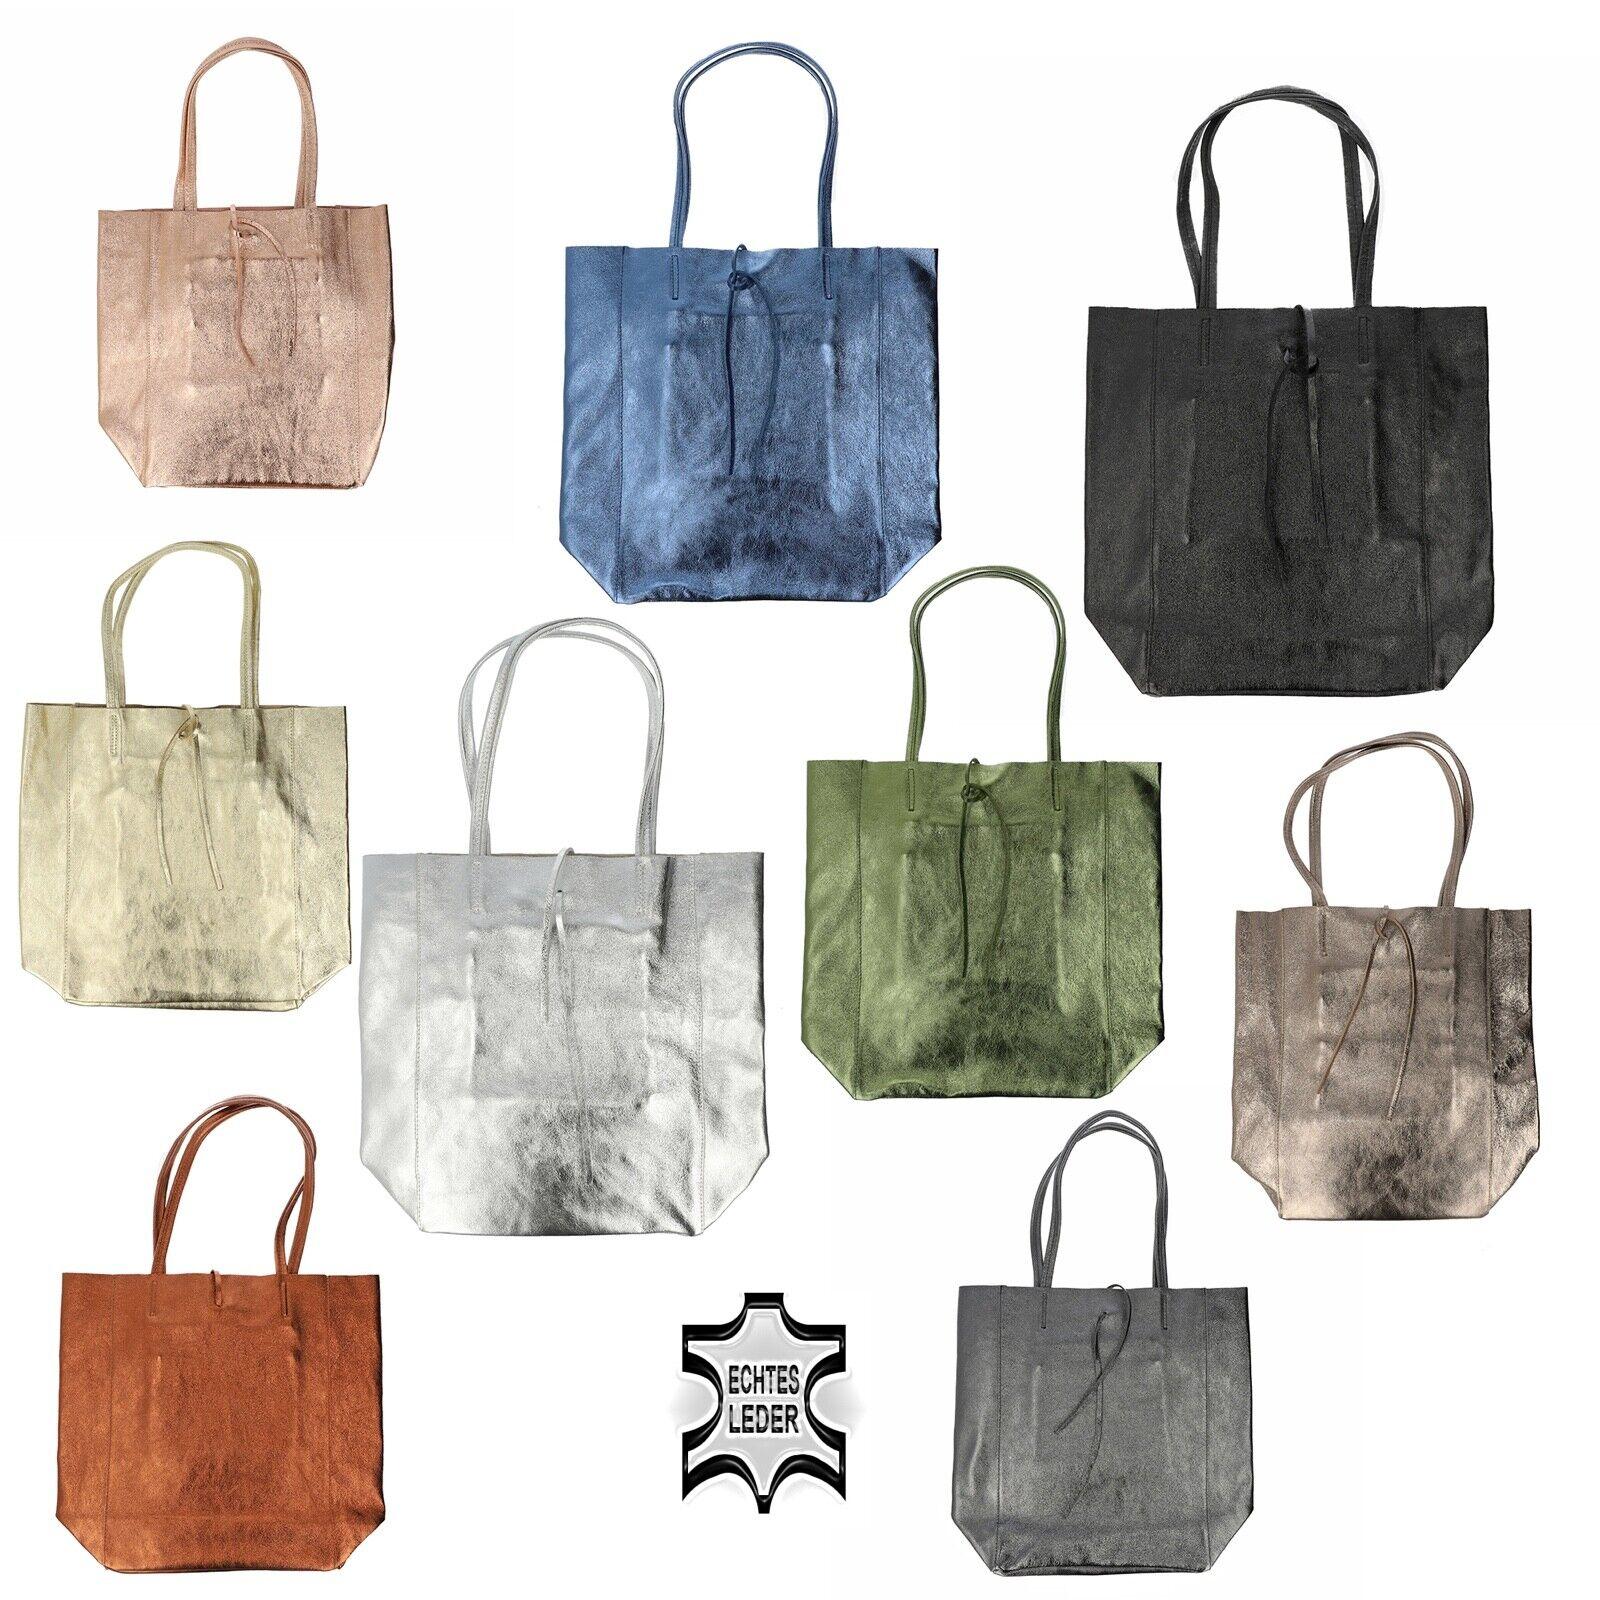 Metallisch Shopper Schulter Hand Tasche Italy WildelederPelle A4 Metallic NEU